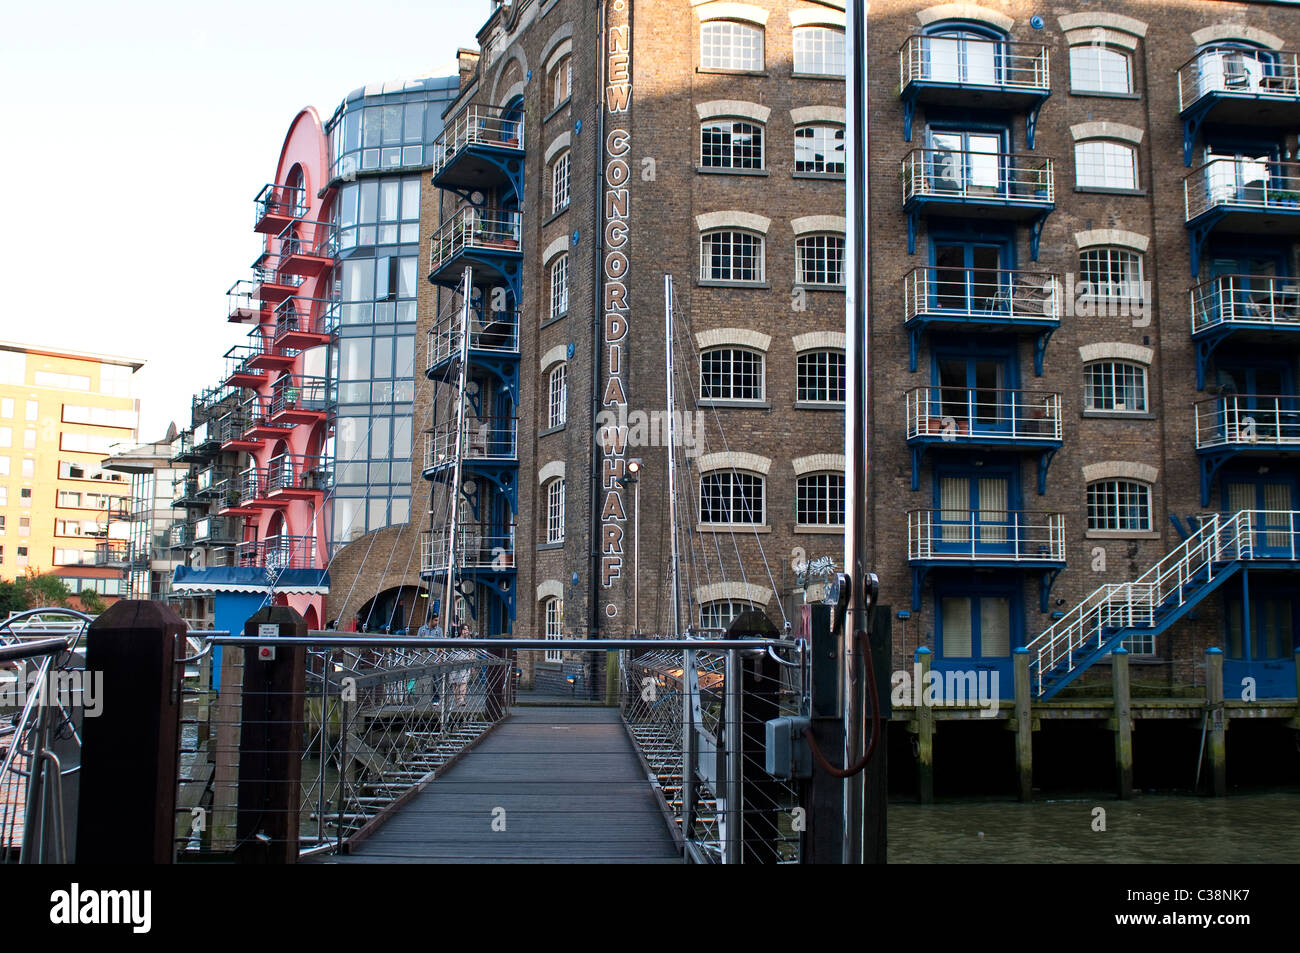 New bridge at St Saviour's Dock, Neckinger, SE1, London, UK - Stock Image